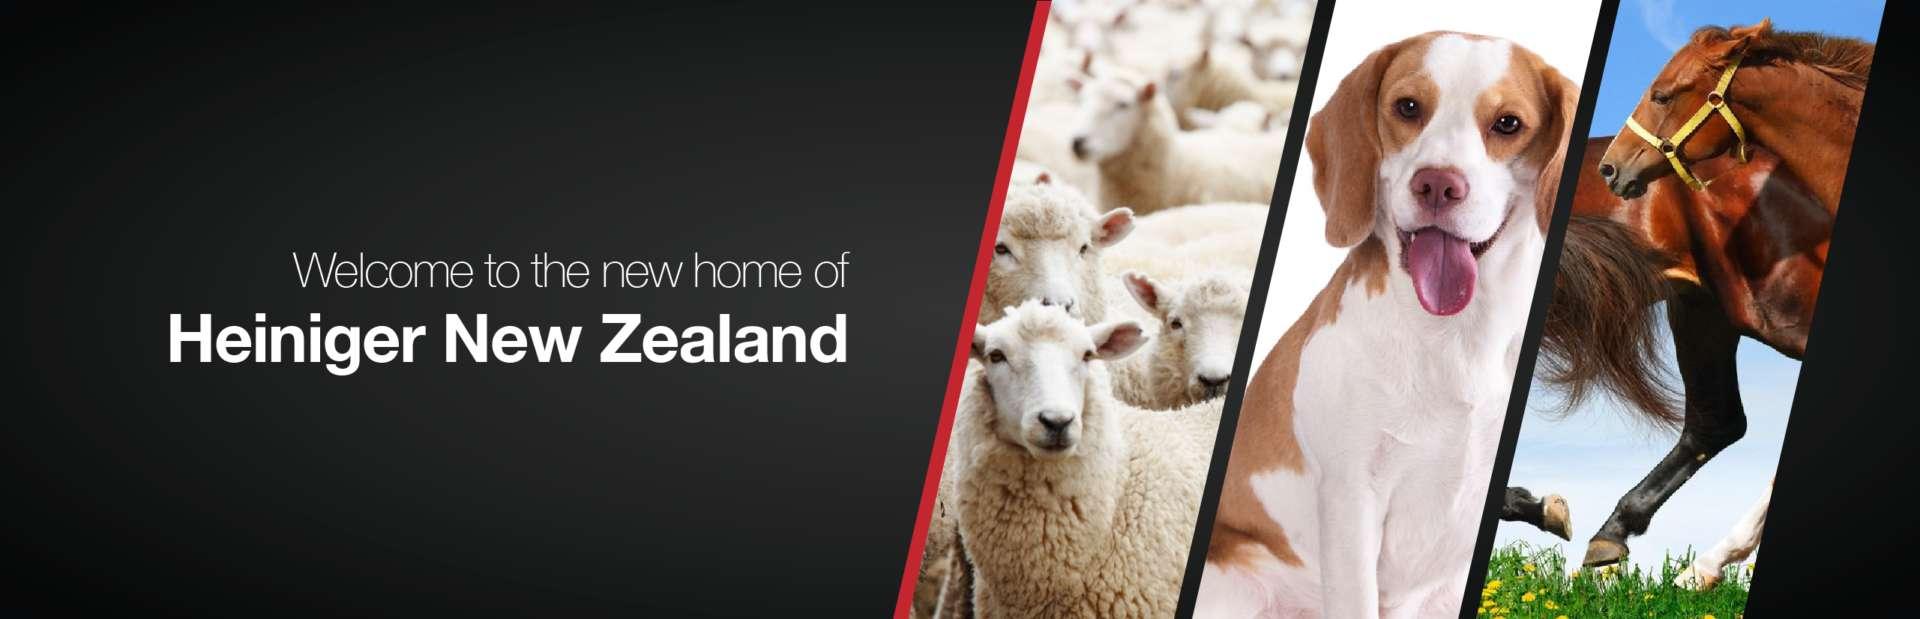 Welcome To Heiniger New Zealand